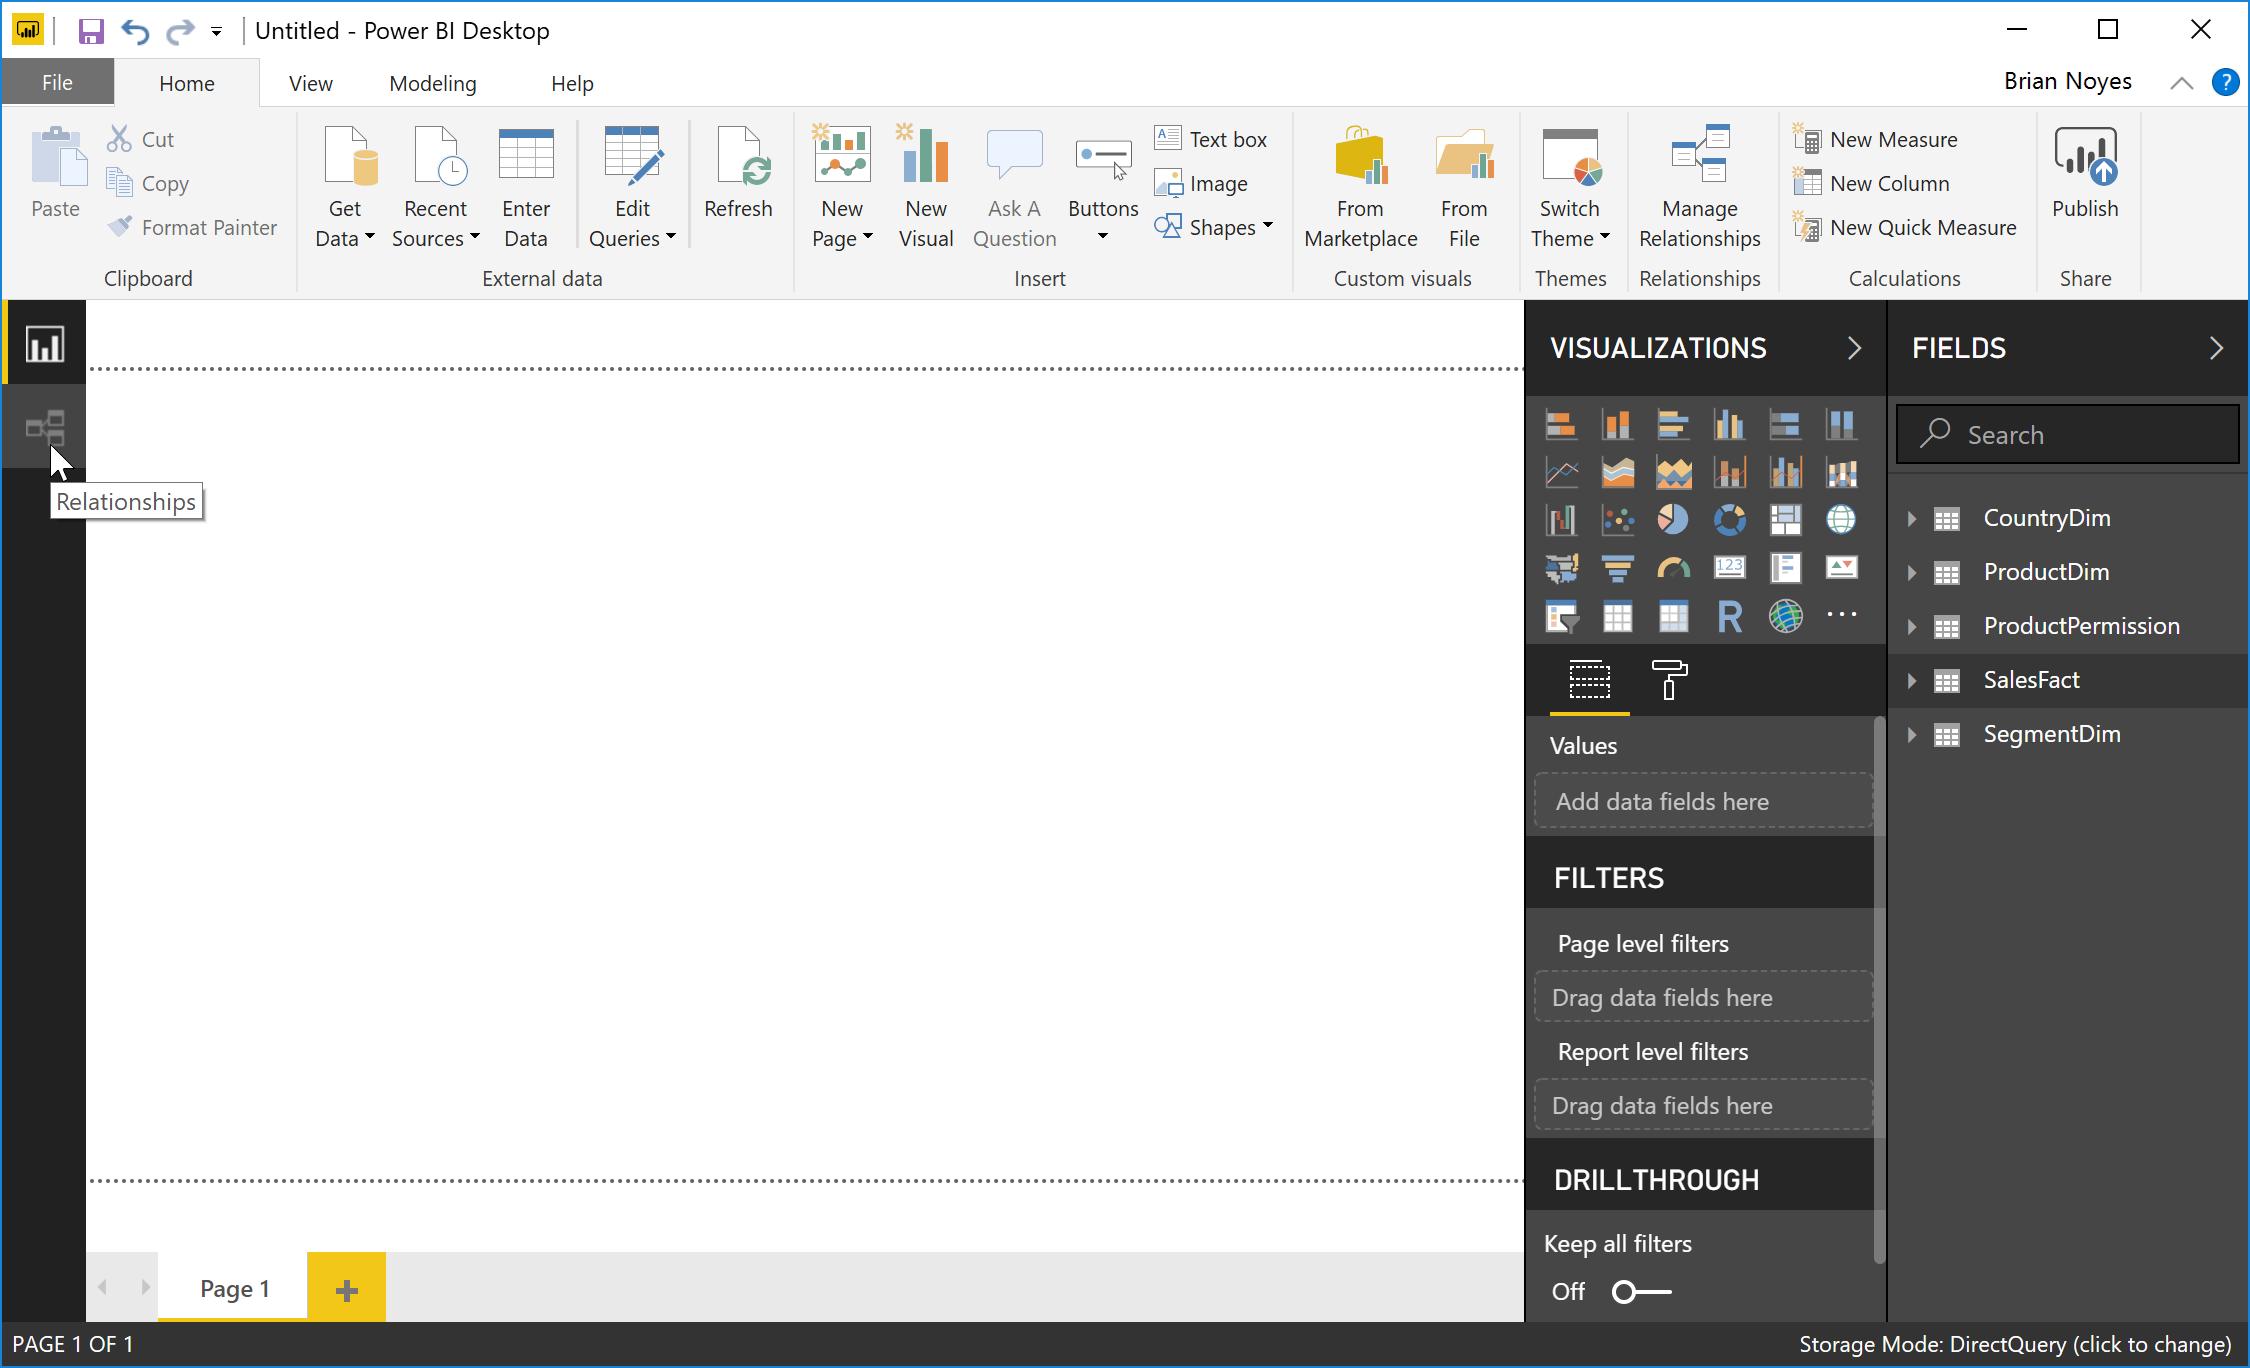 Figure 7: Switching to Relationships view in Power BI Desktop